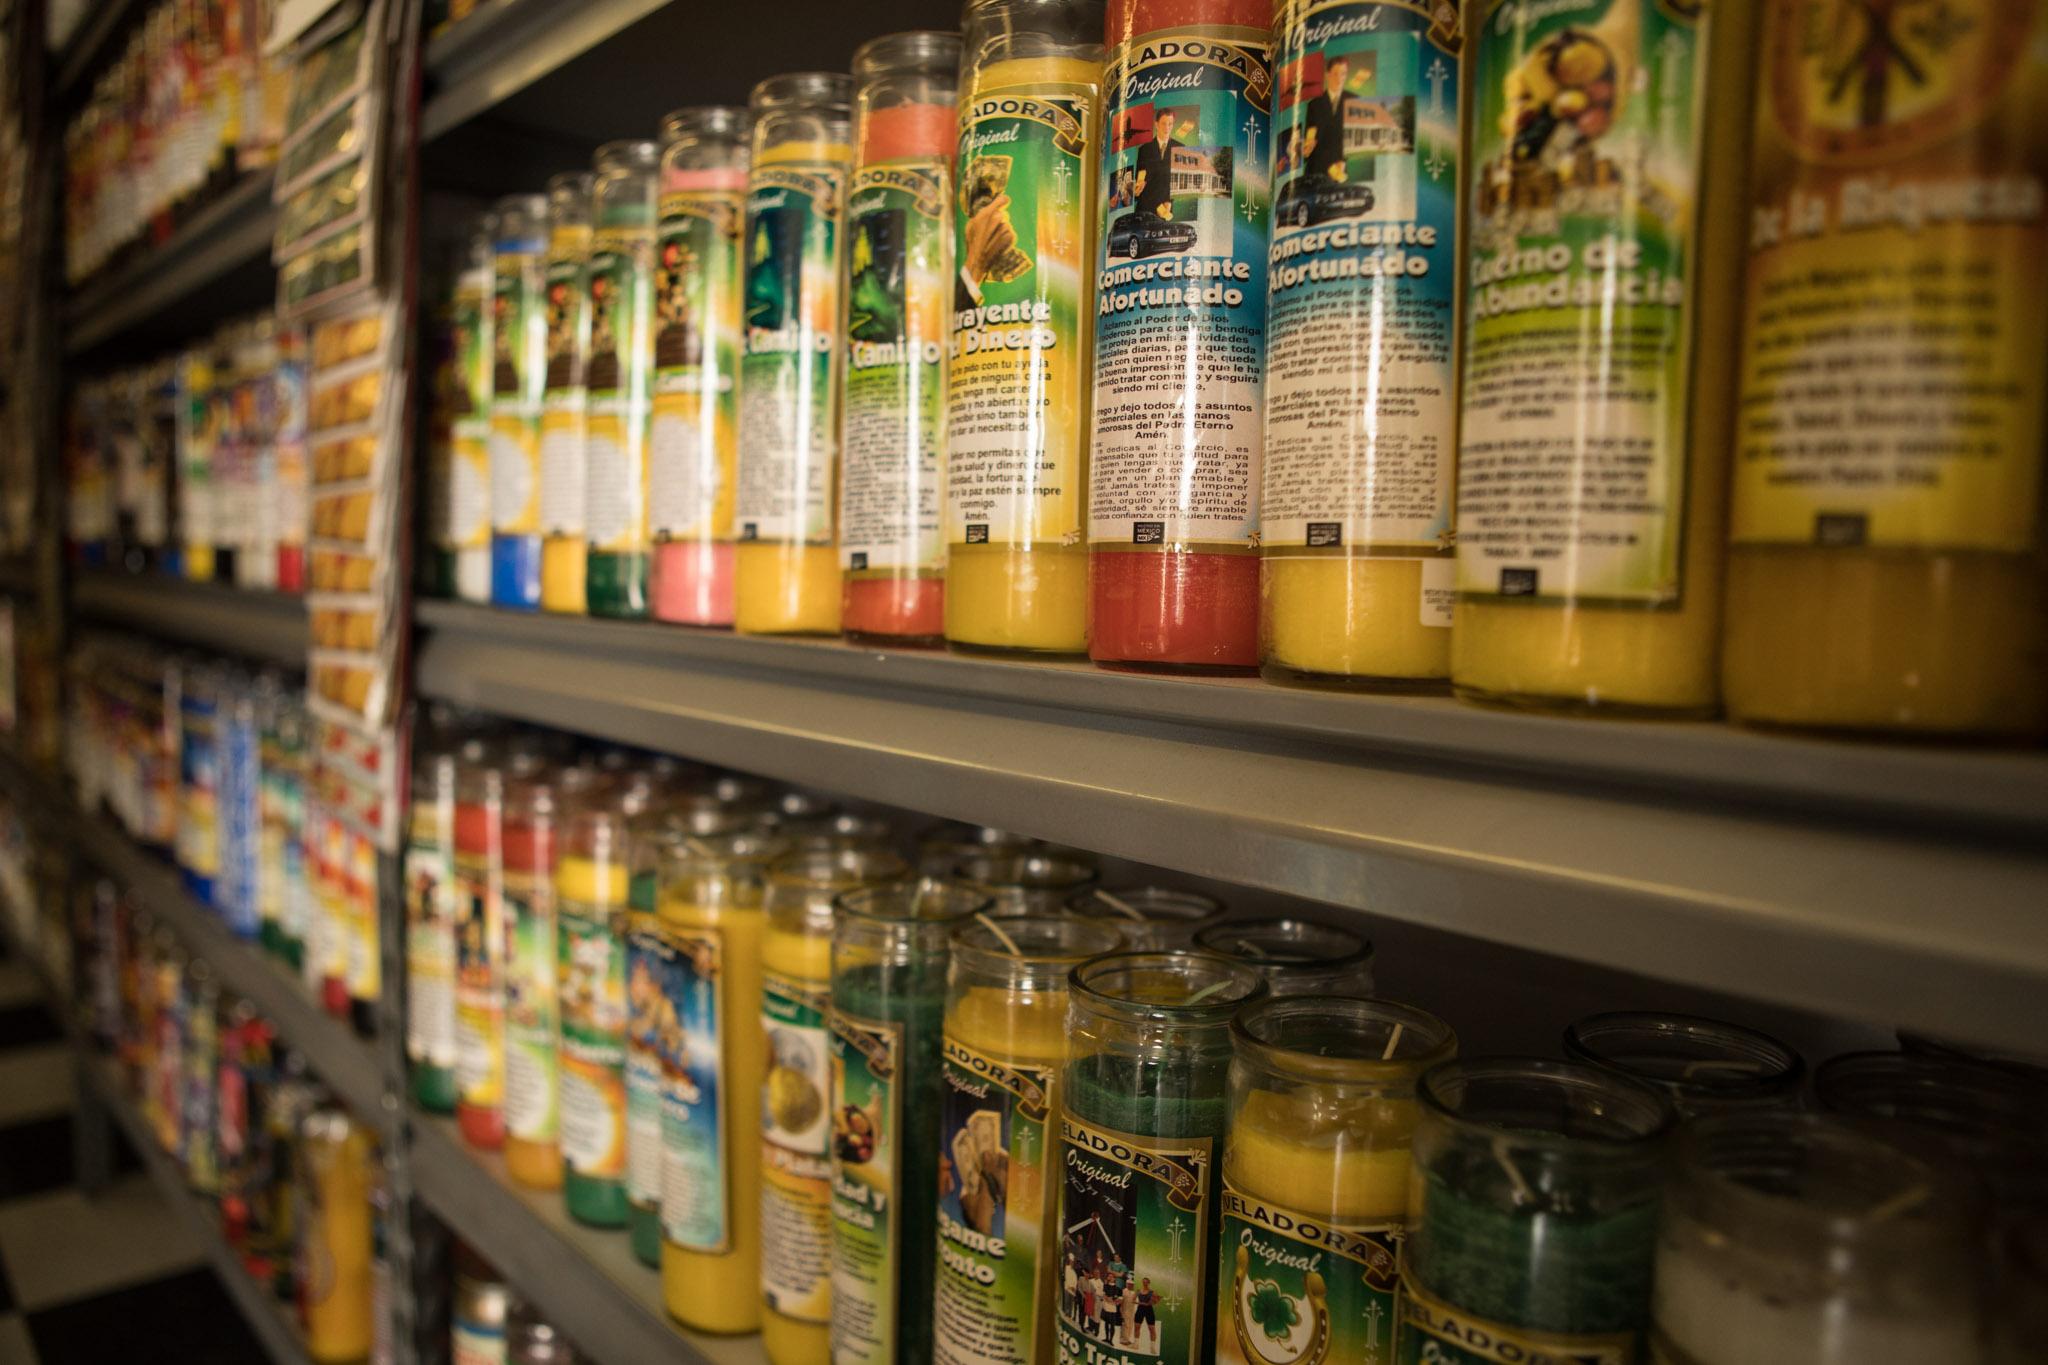 Candles line the shelves of Botanica Obadina.